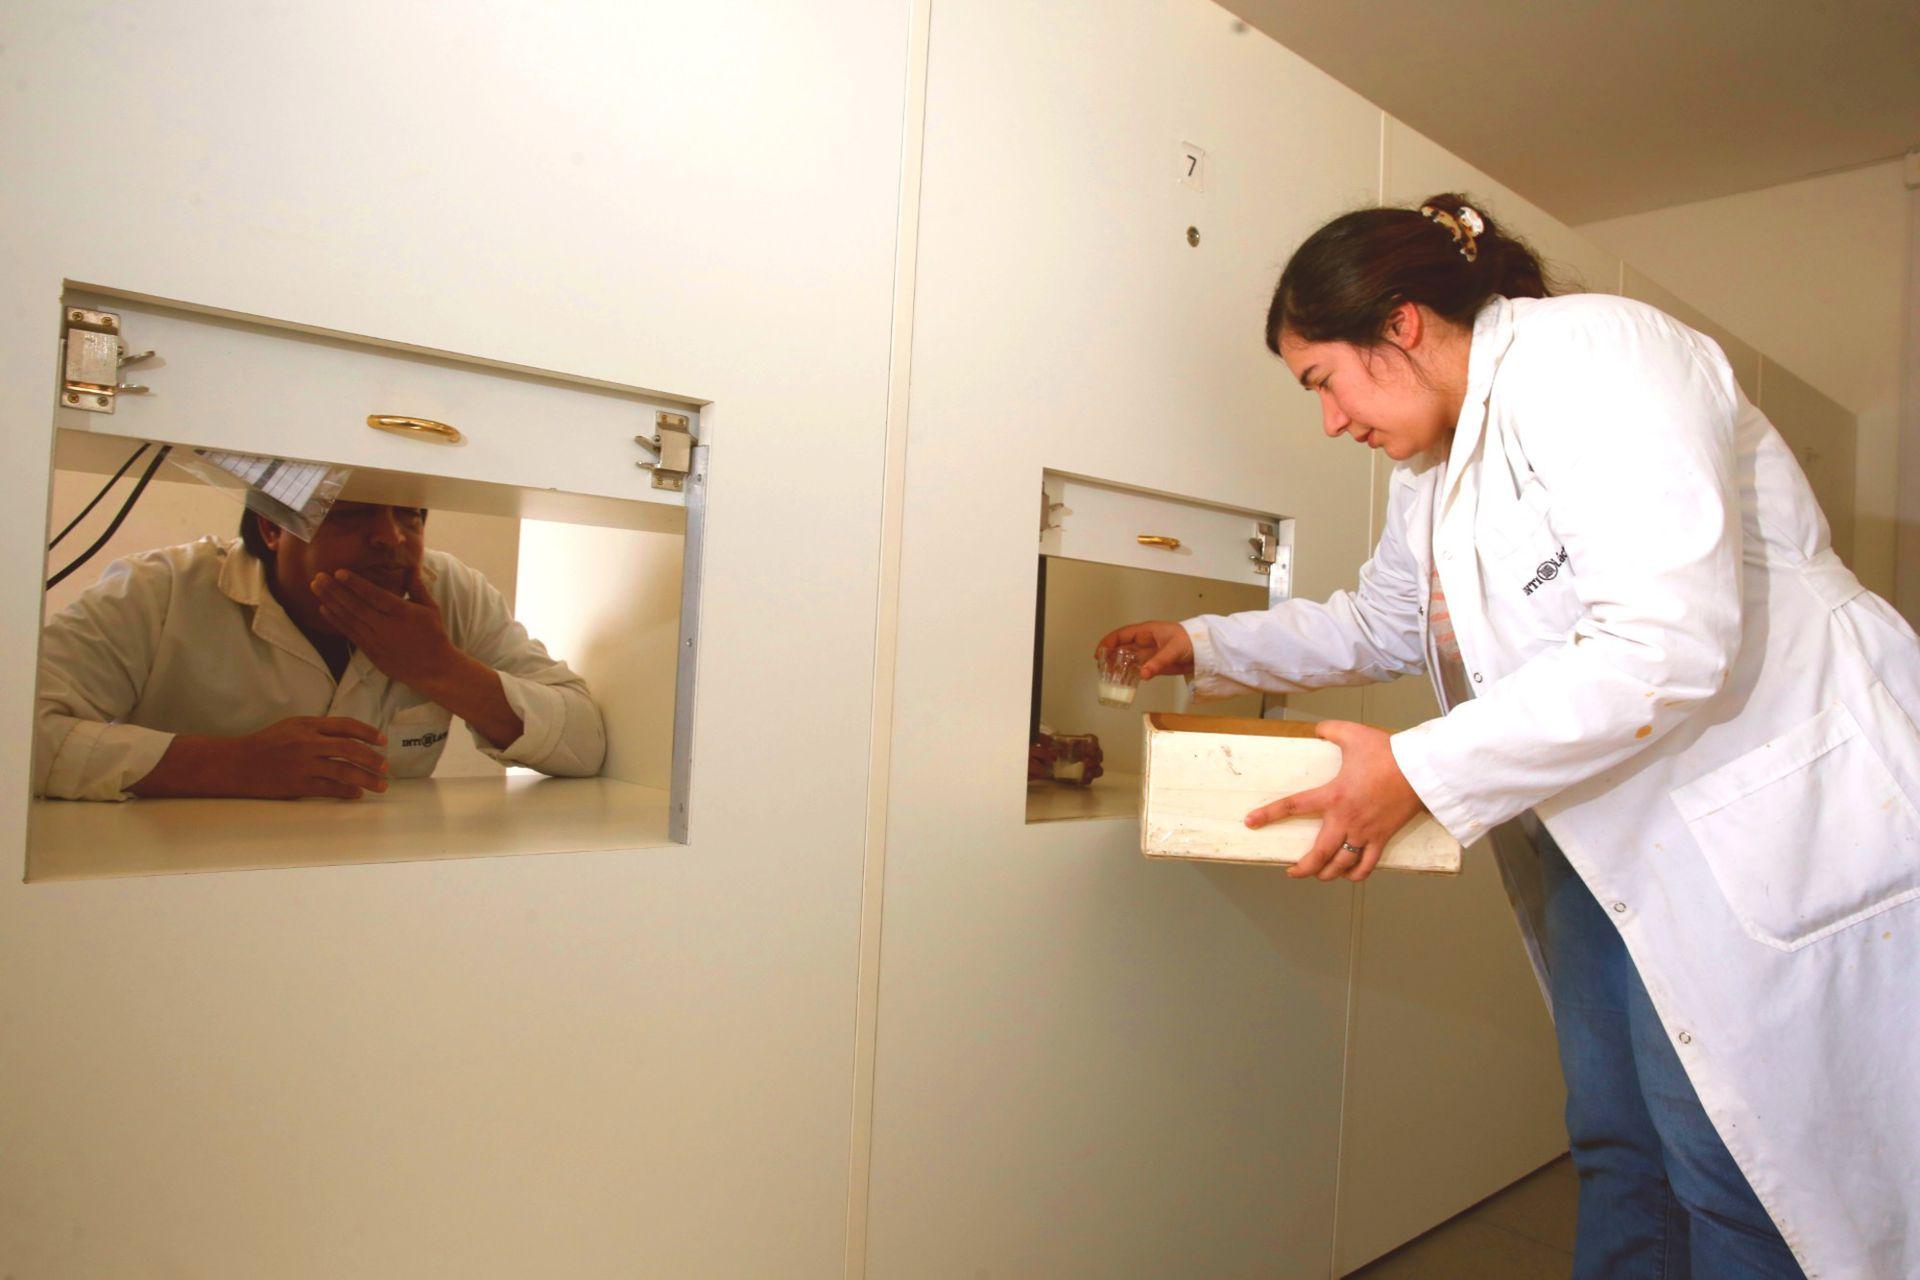 Ayelén Gian Marco reparte las muestras a catar